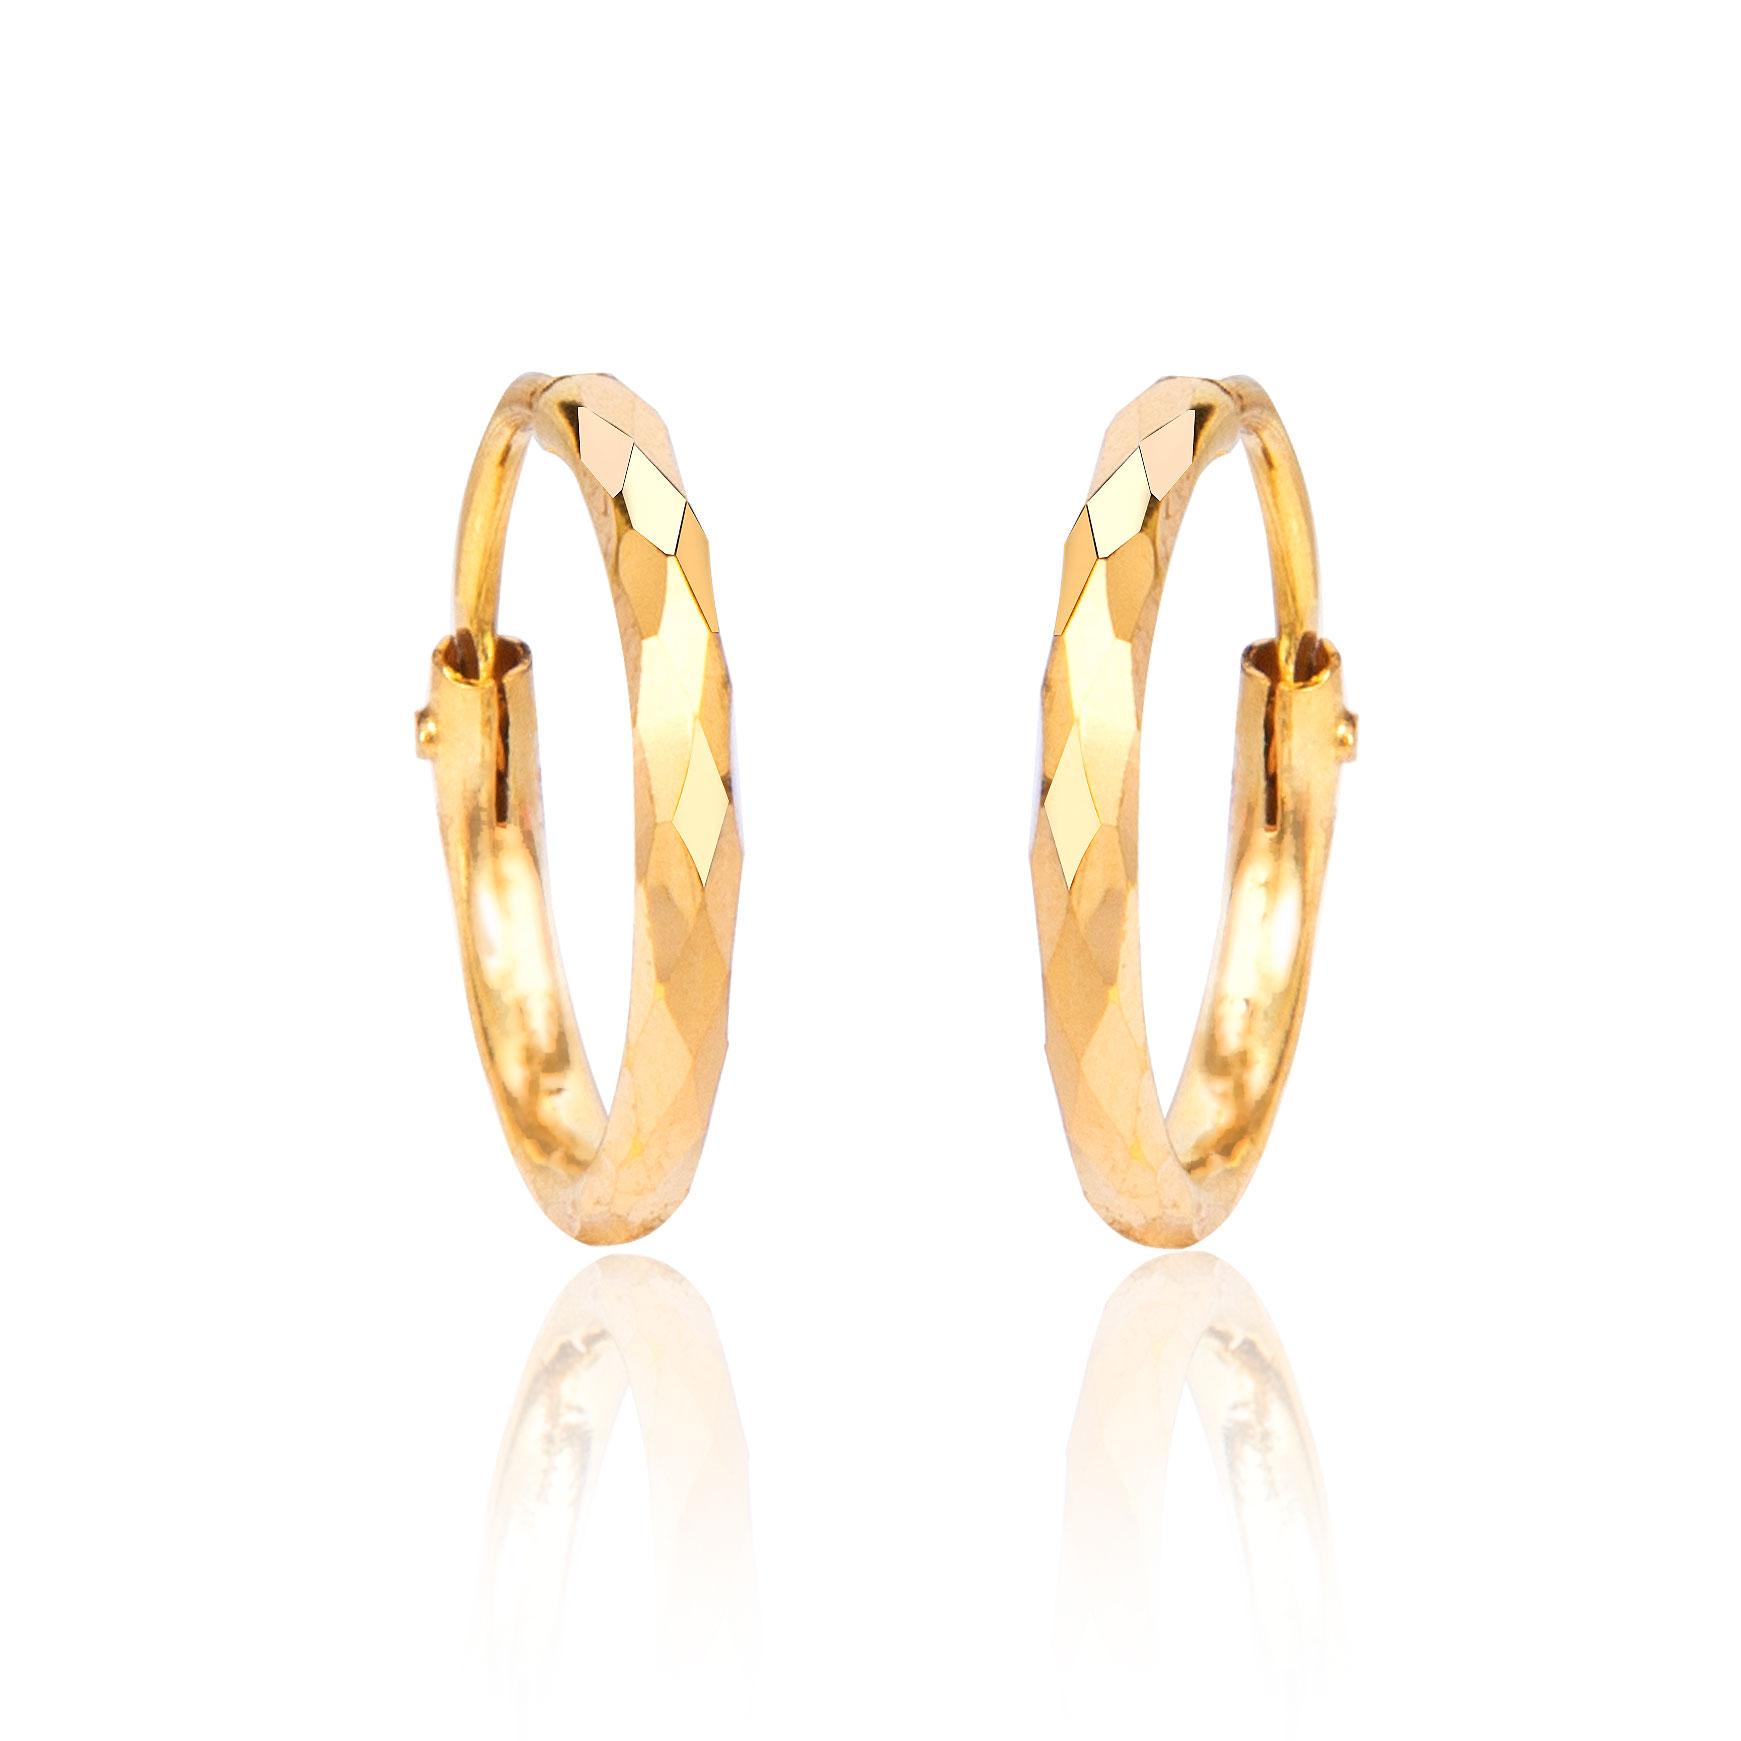 Latika Gold Hoop Earrings